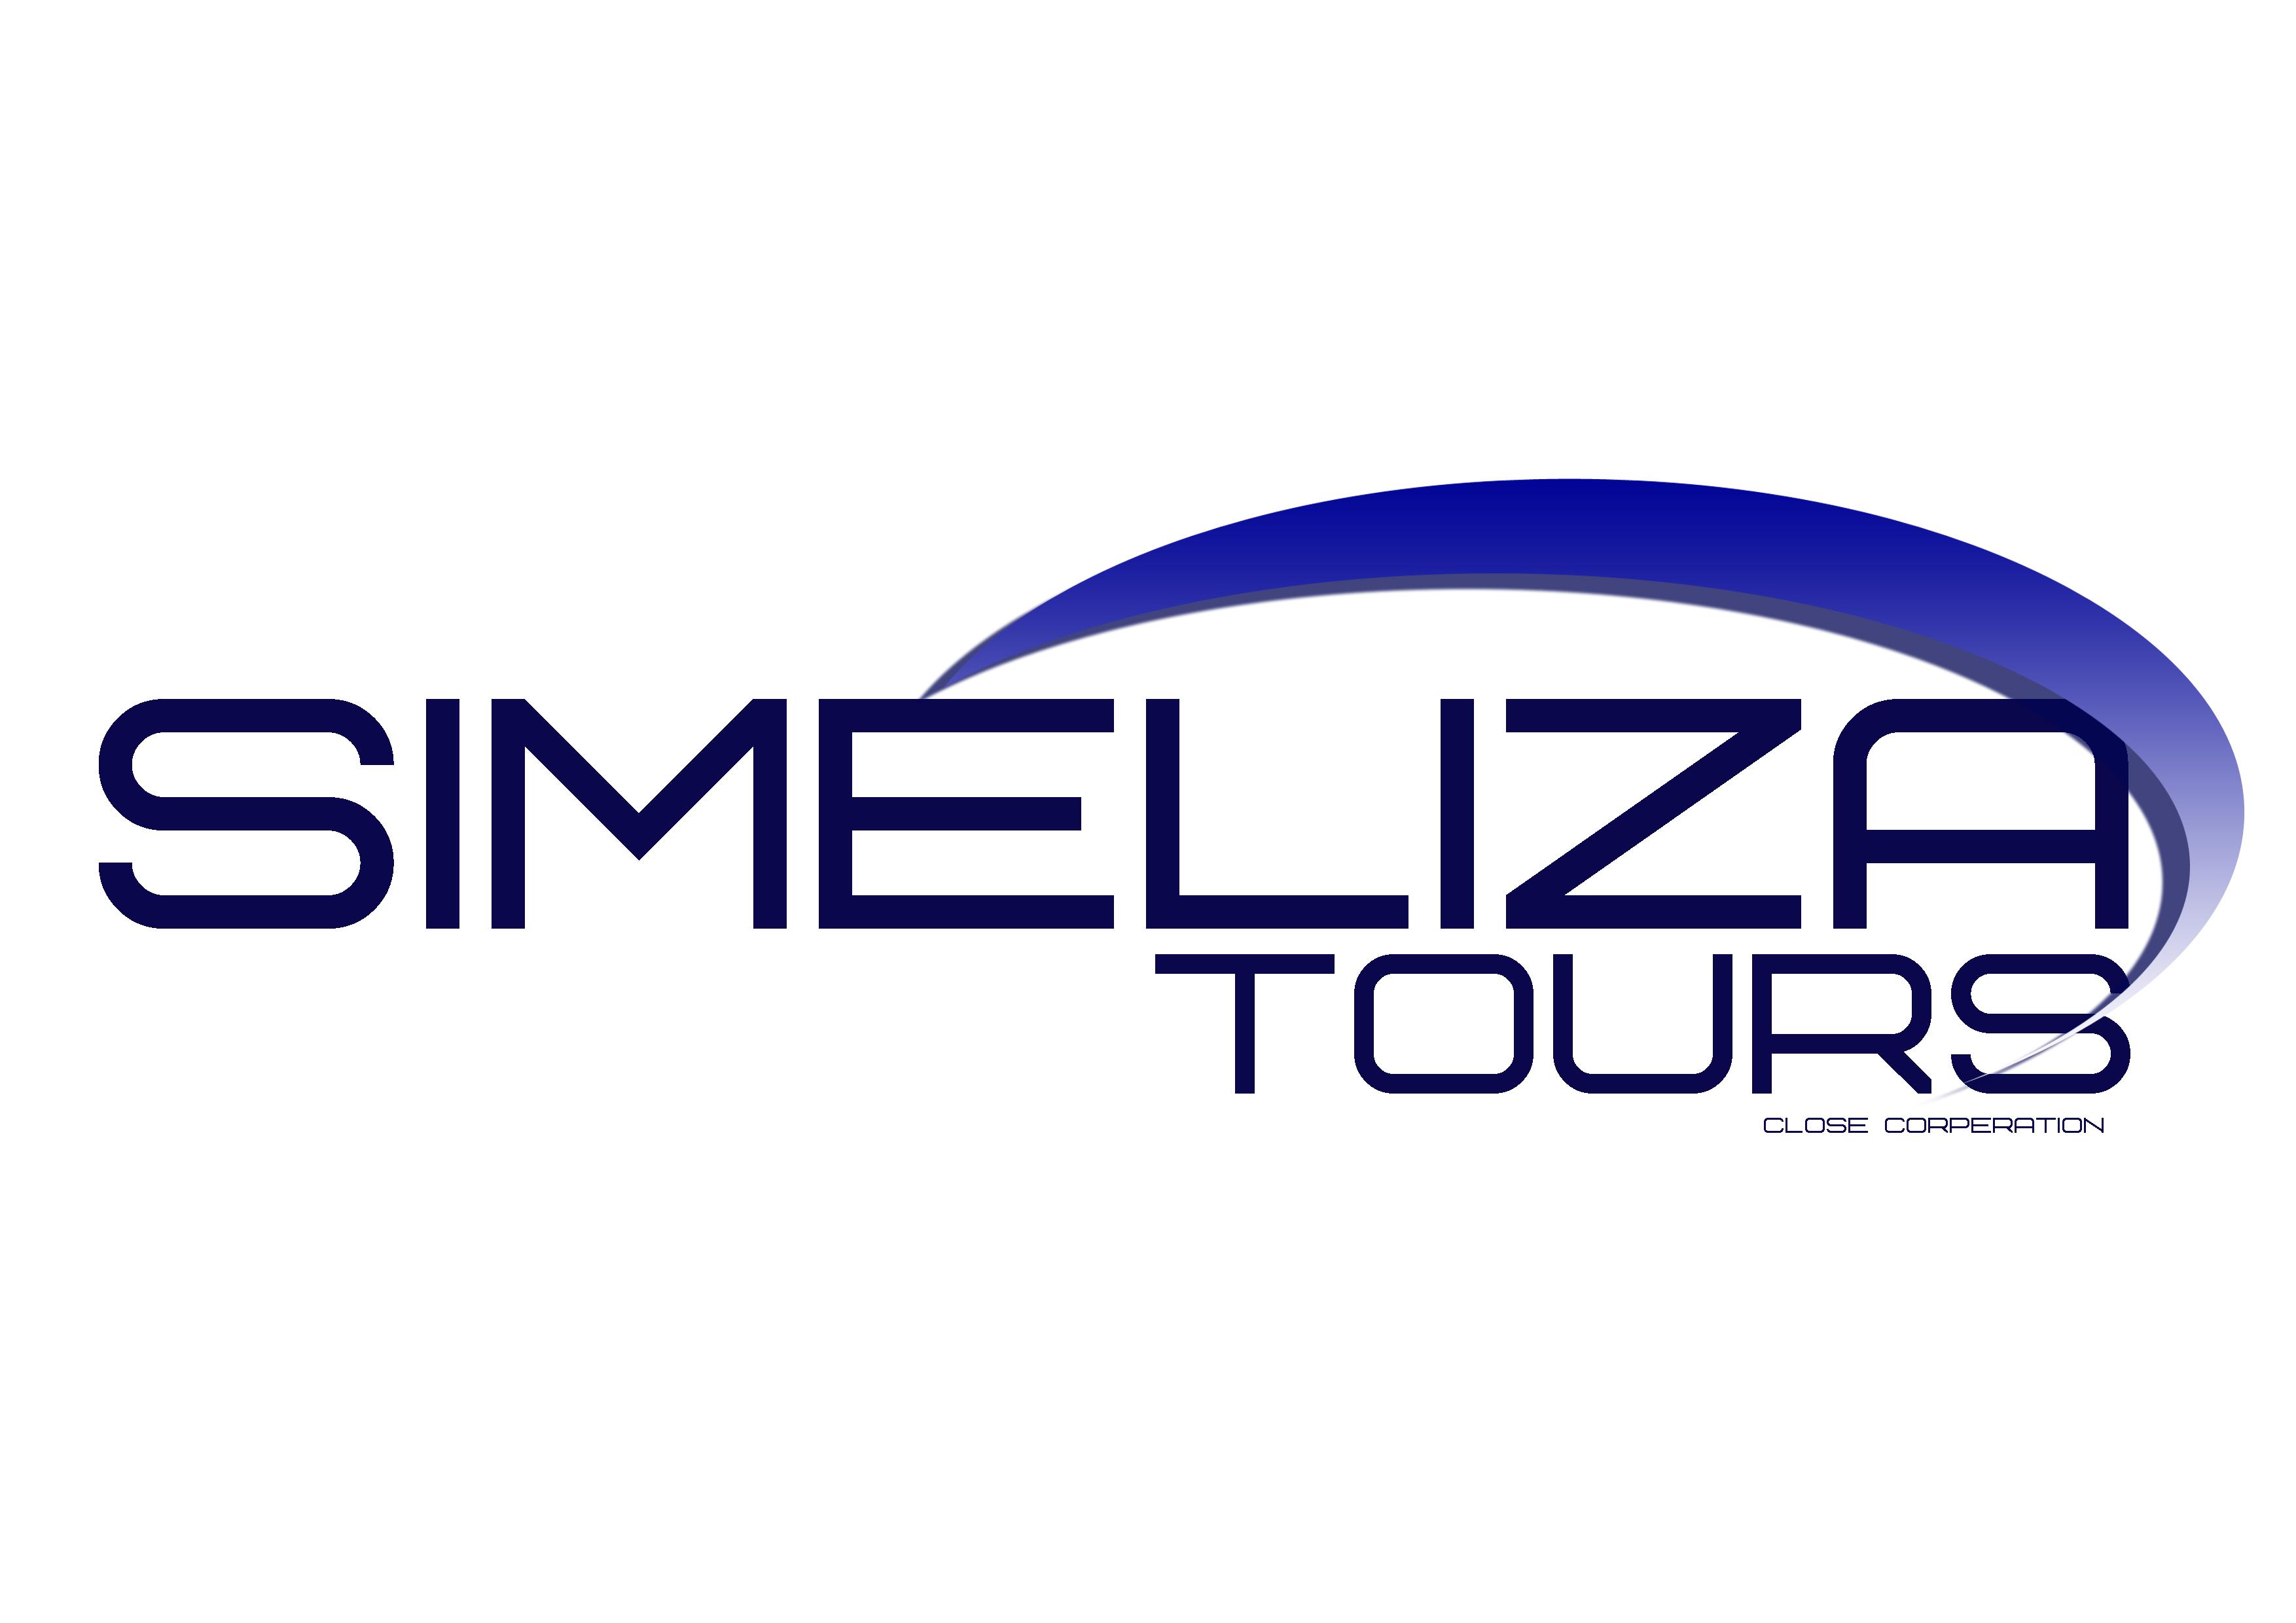 SIMELIZA TOURS